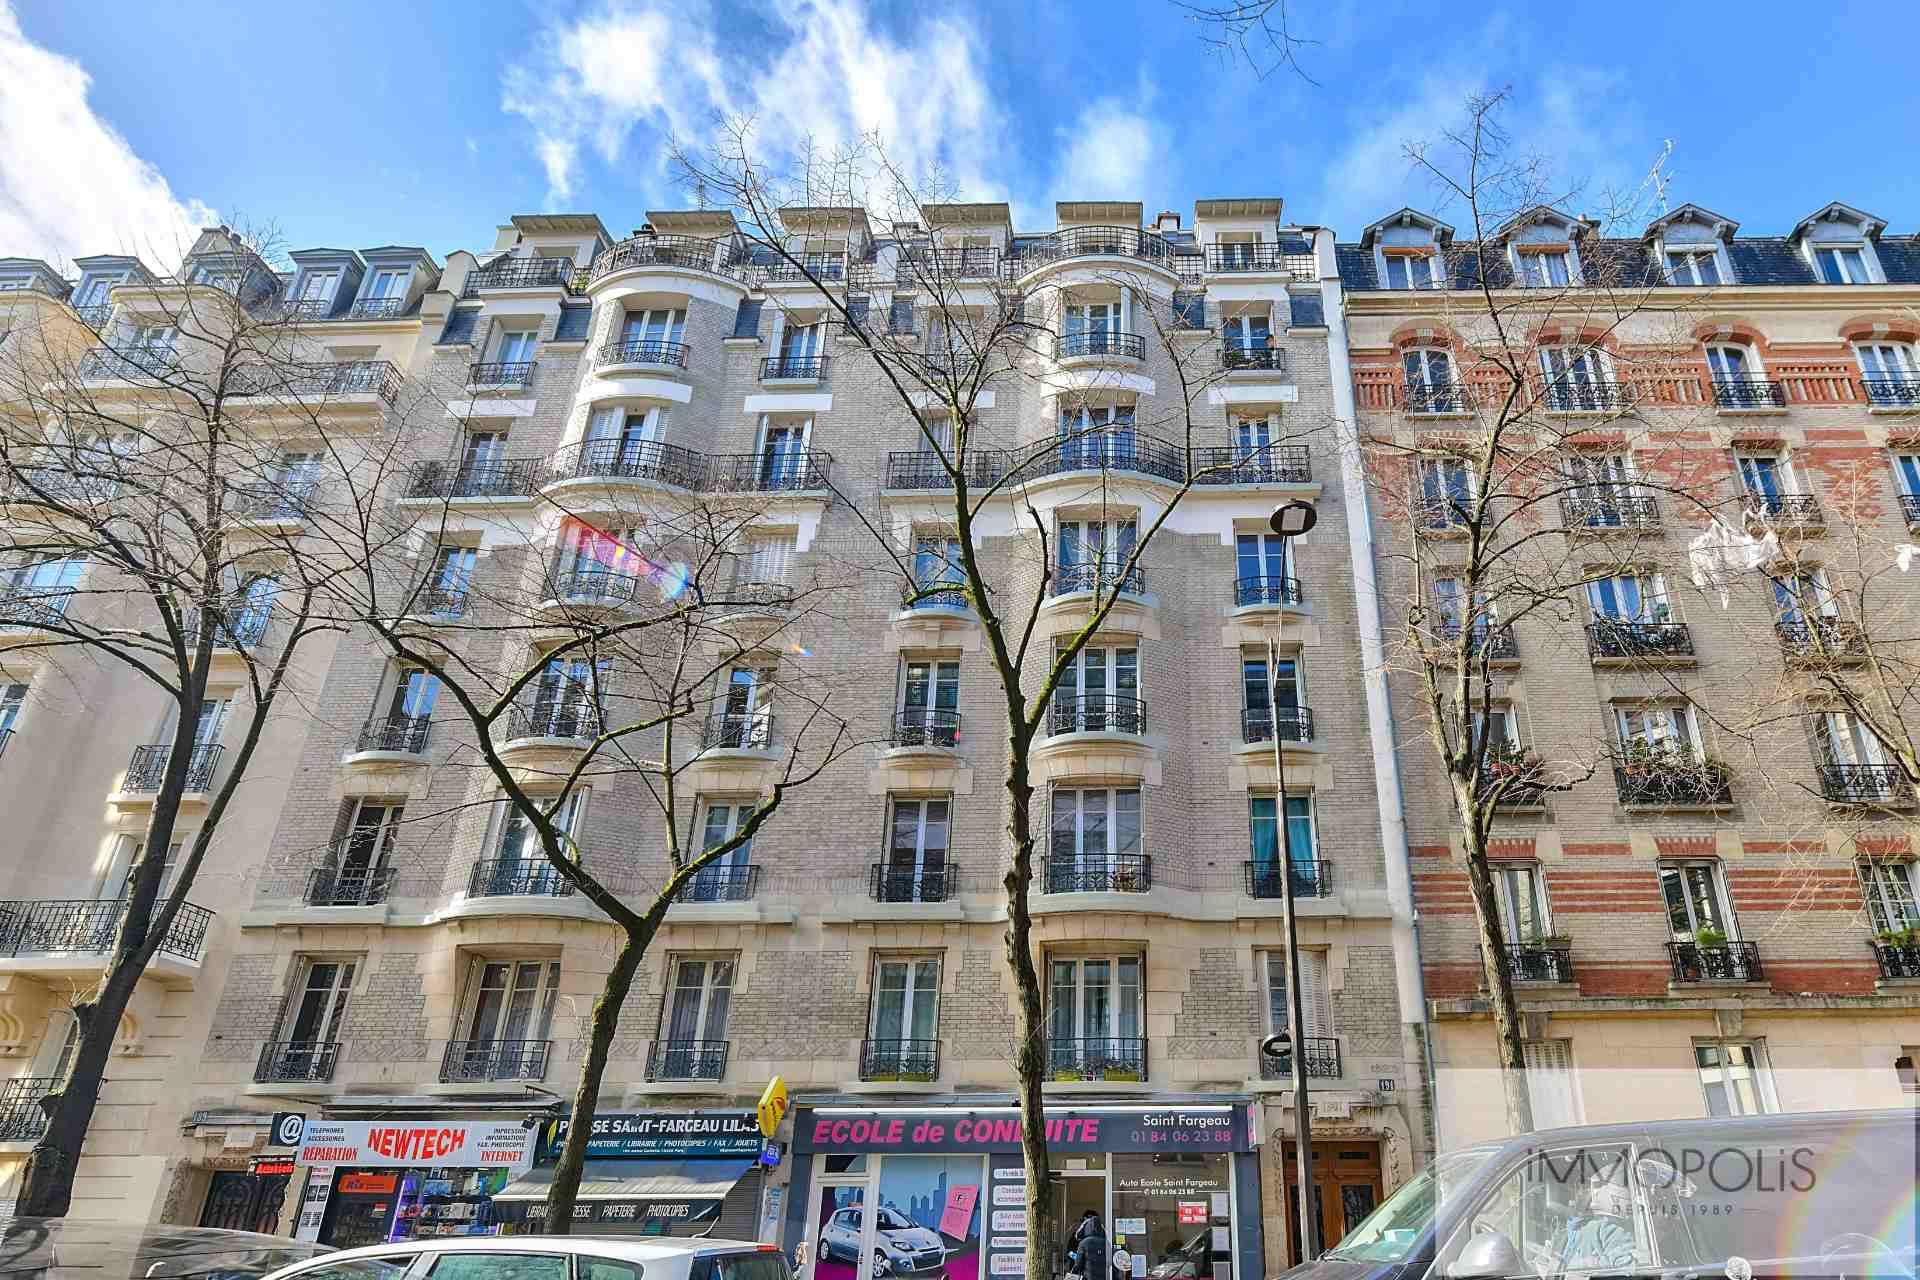 METRO SAINT-FARGEAU: 3 Rooms of 51m², Beautiful classic, Balcony 1